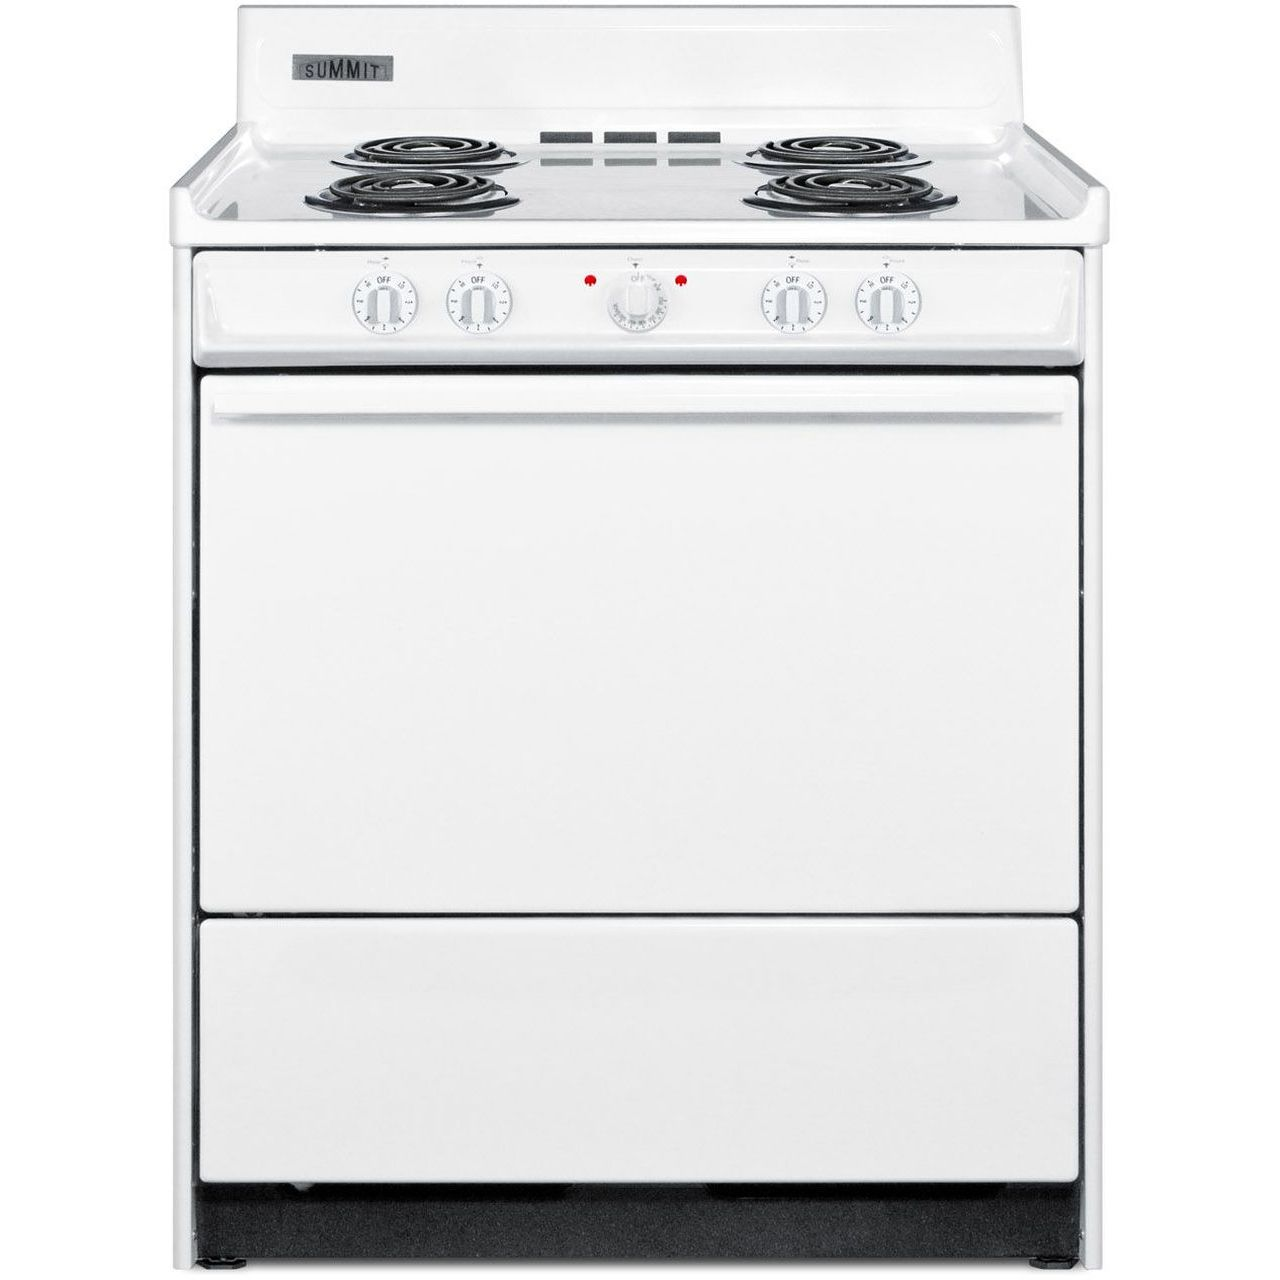 Summit WEM210 30''W 4-Burner Electric Coil Top Range - White/White